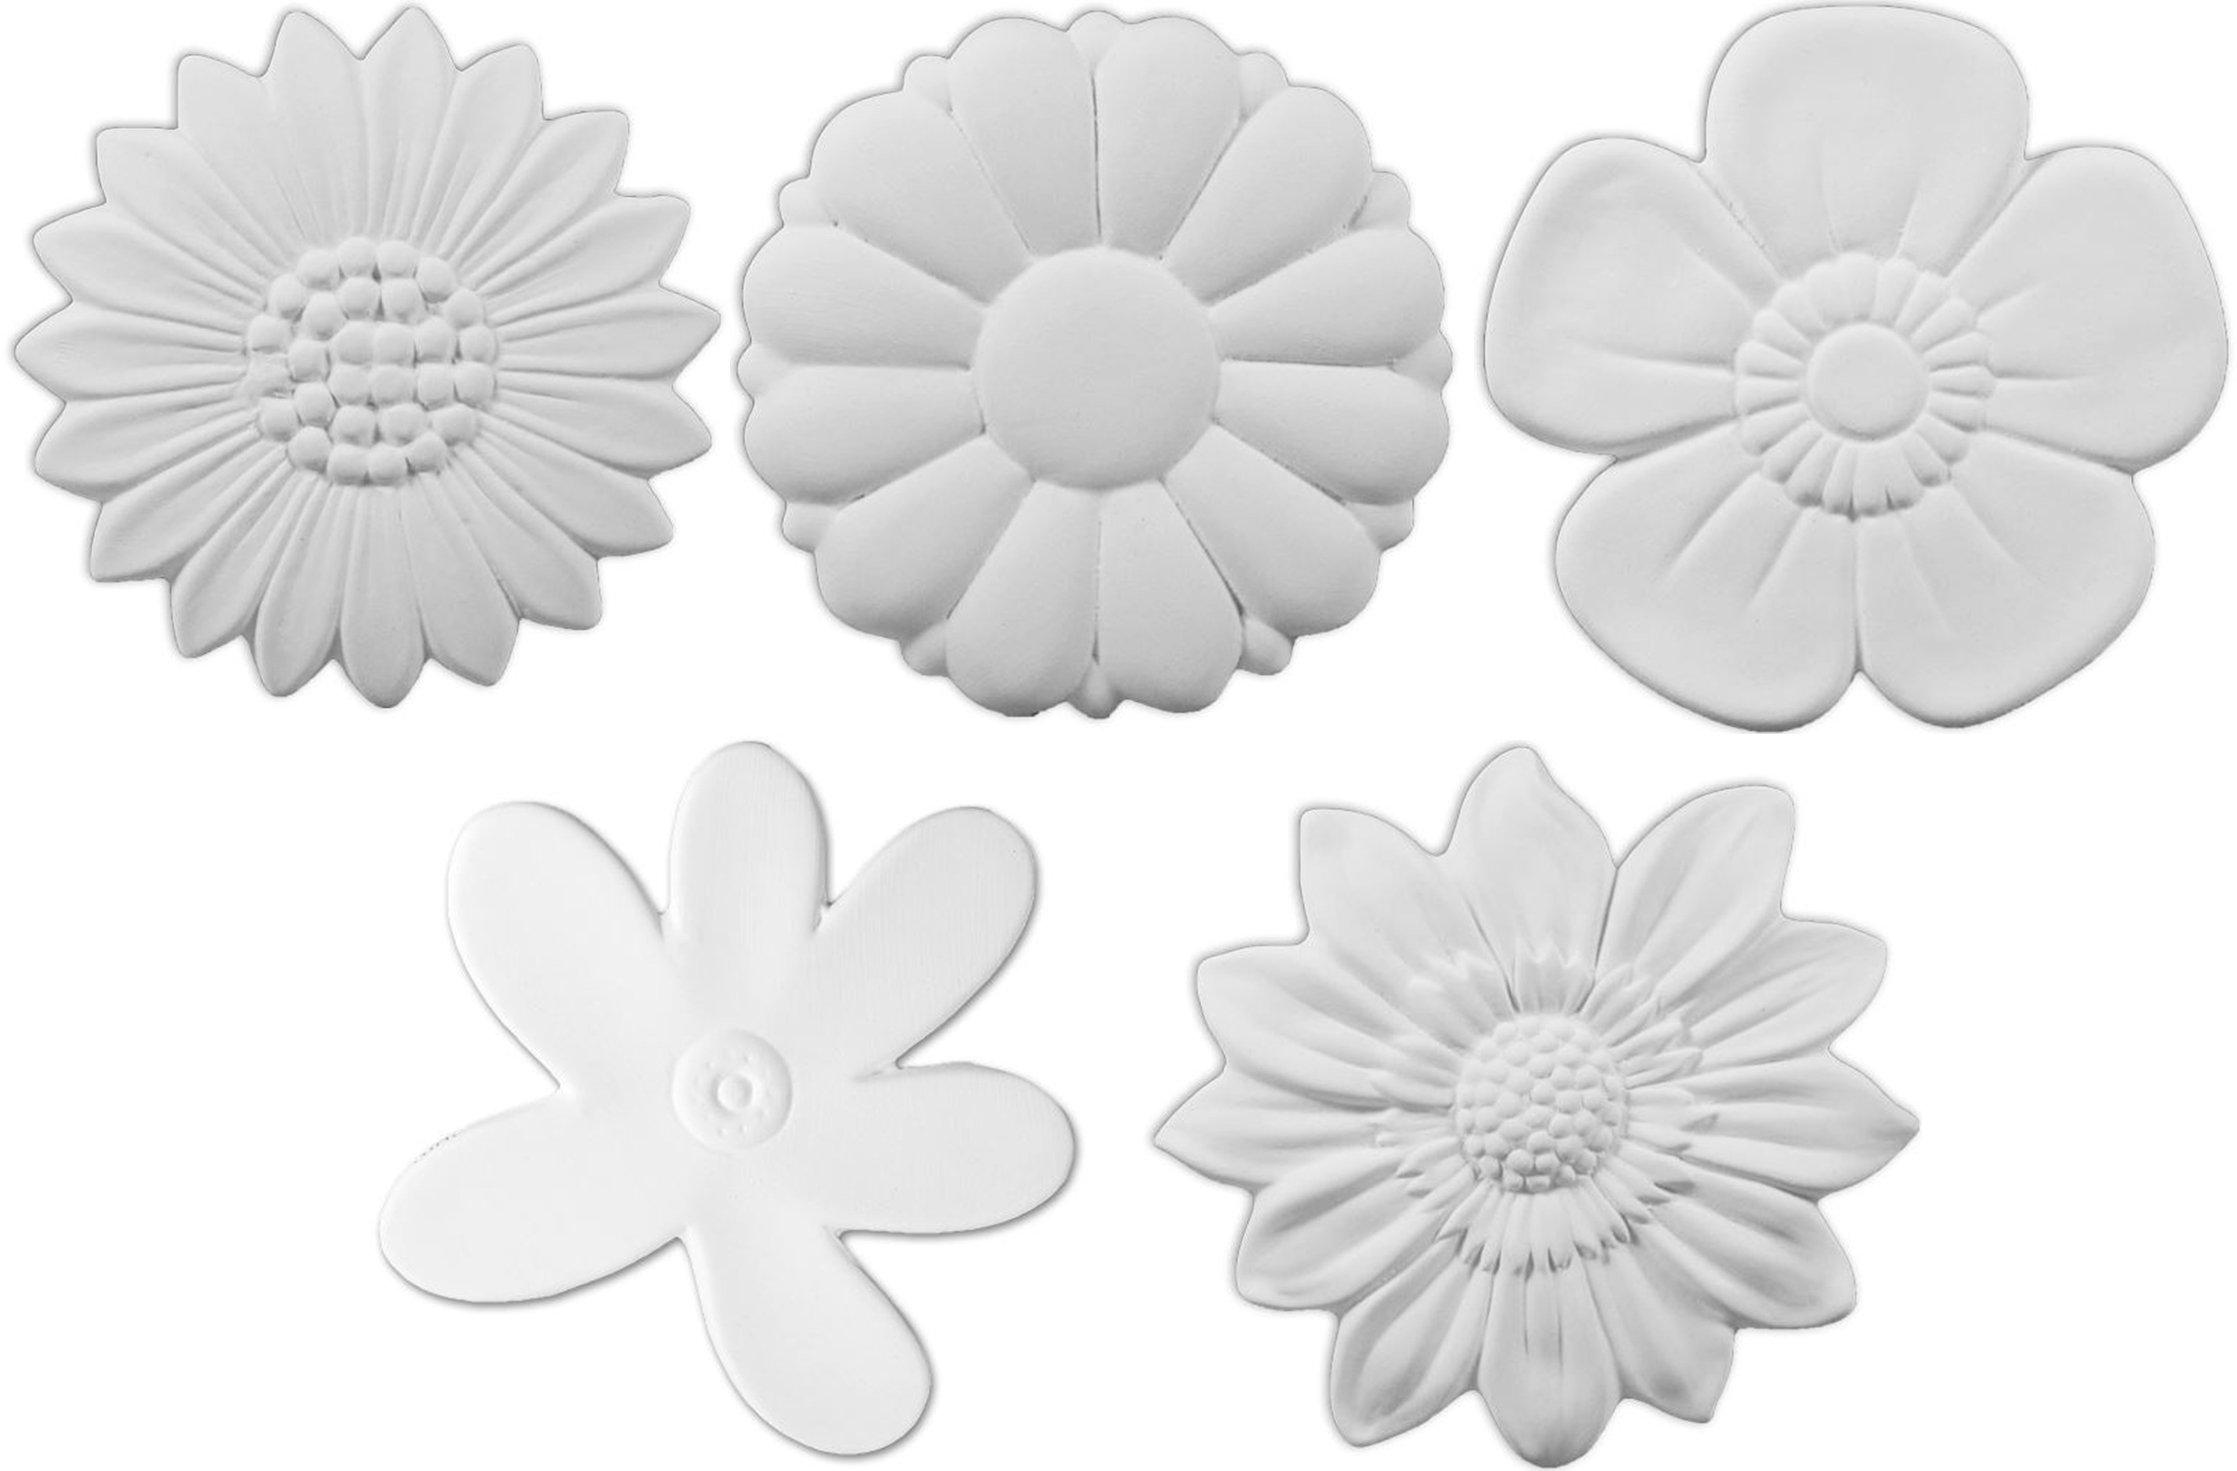 The Garden Flower Collection - Set of 5 - Paint Your Own Floral Ceramic Keepsake Garden